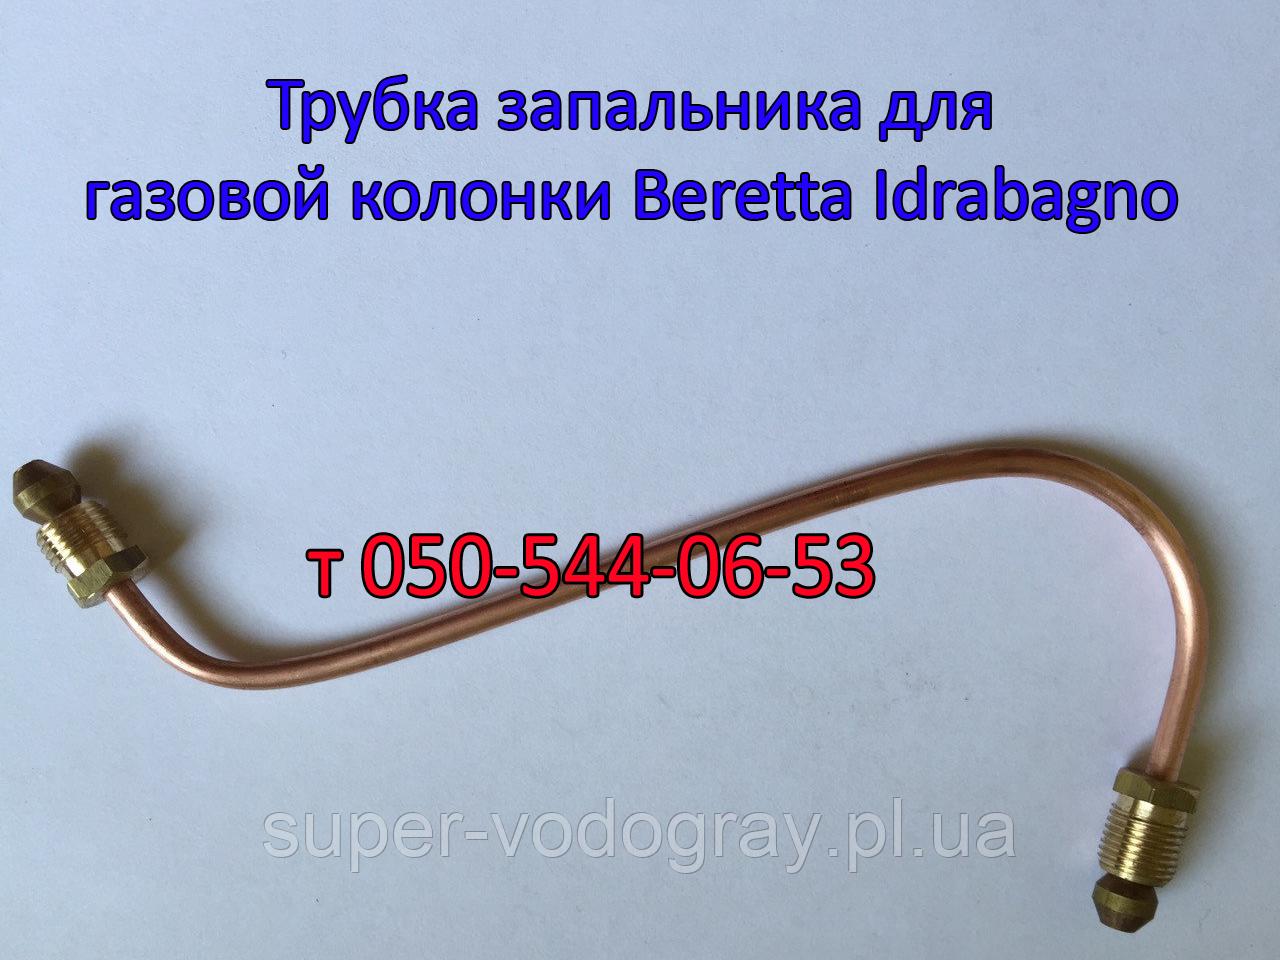 Трубка запальника для газової колонки Beretta Idrabagno